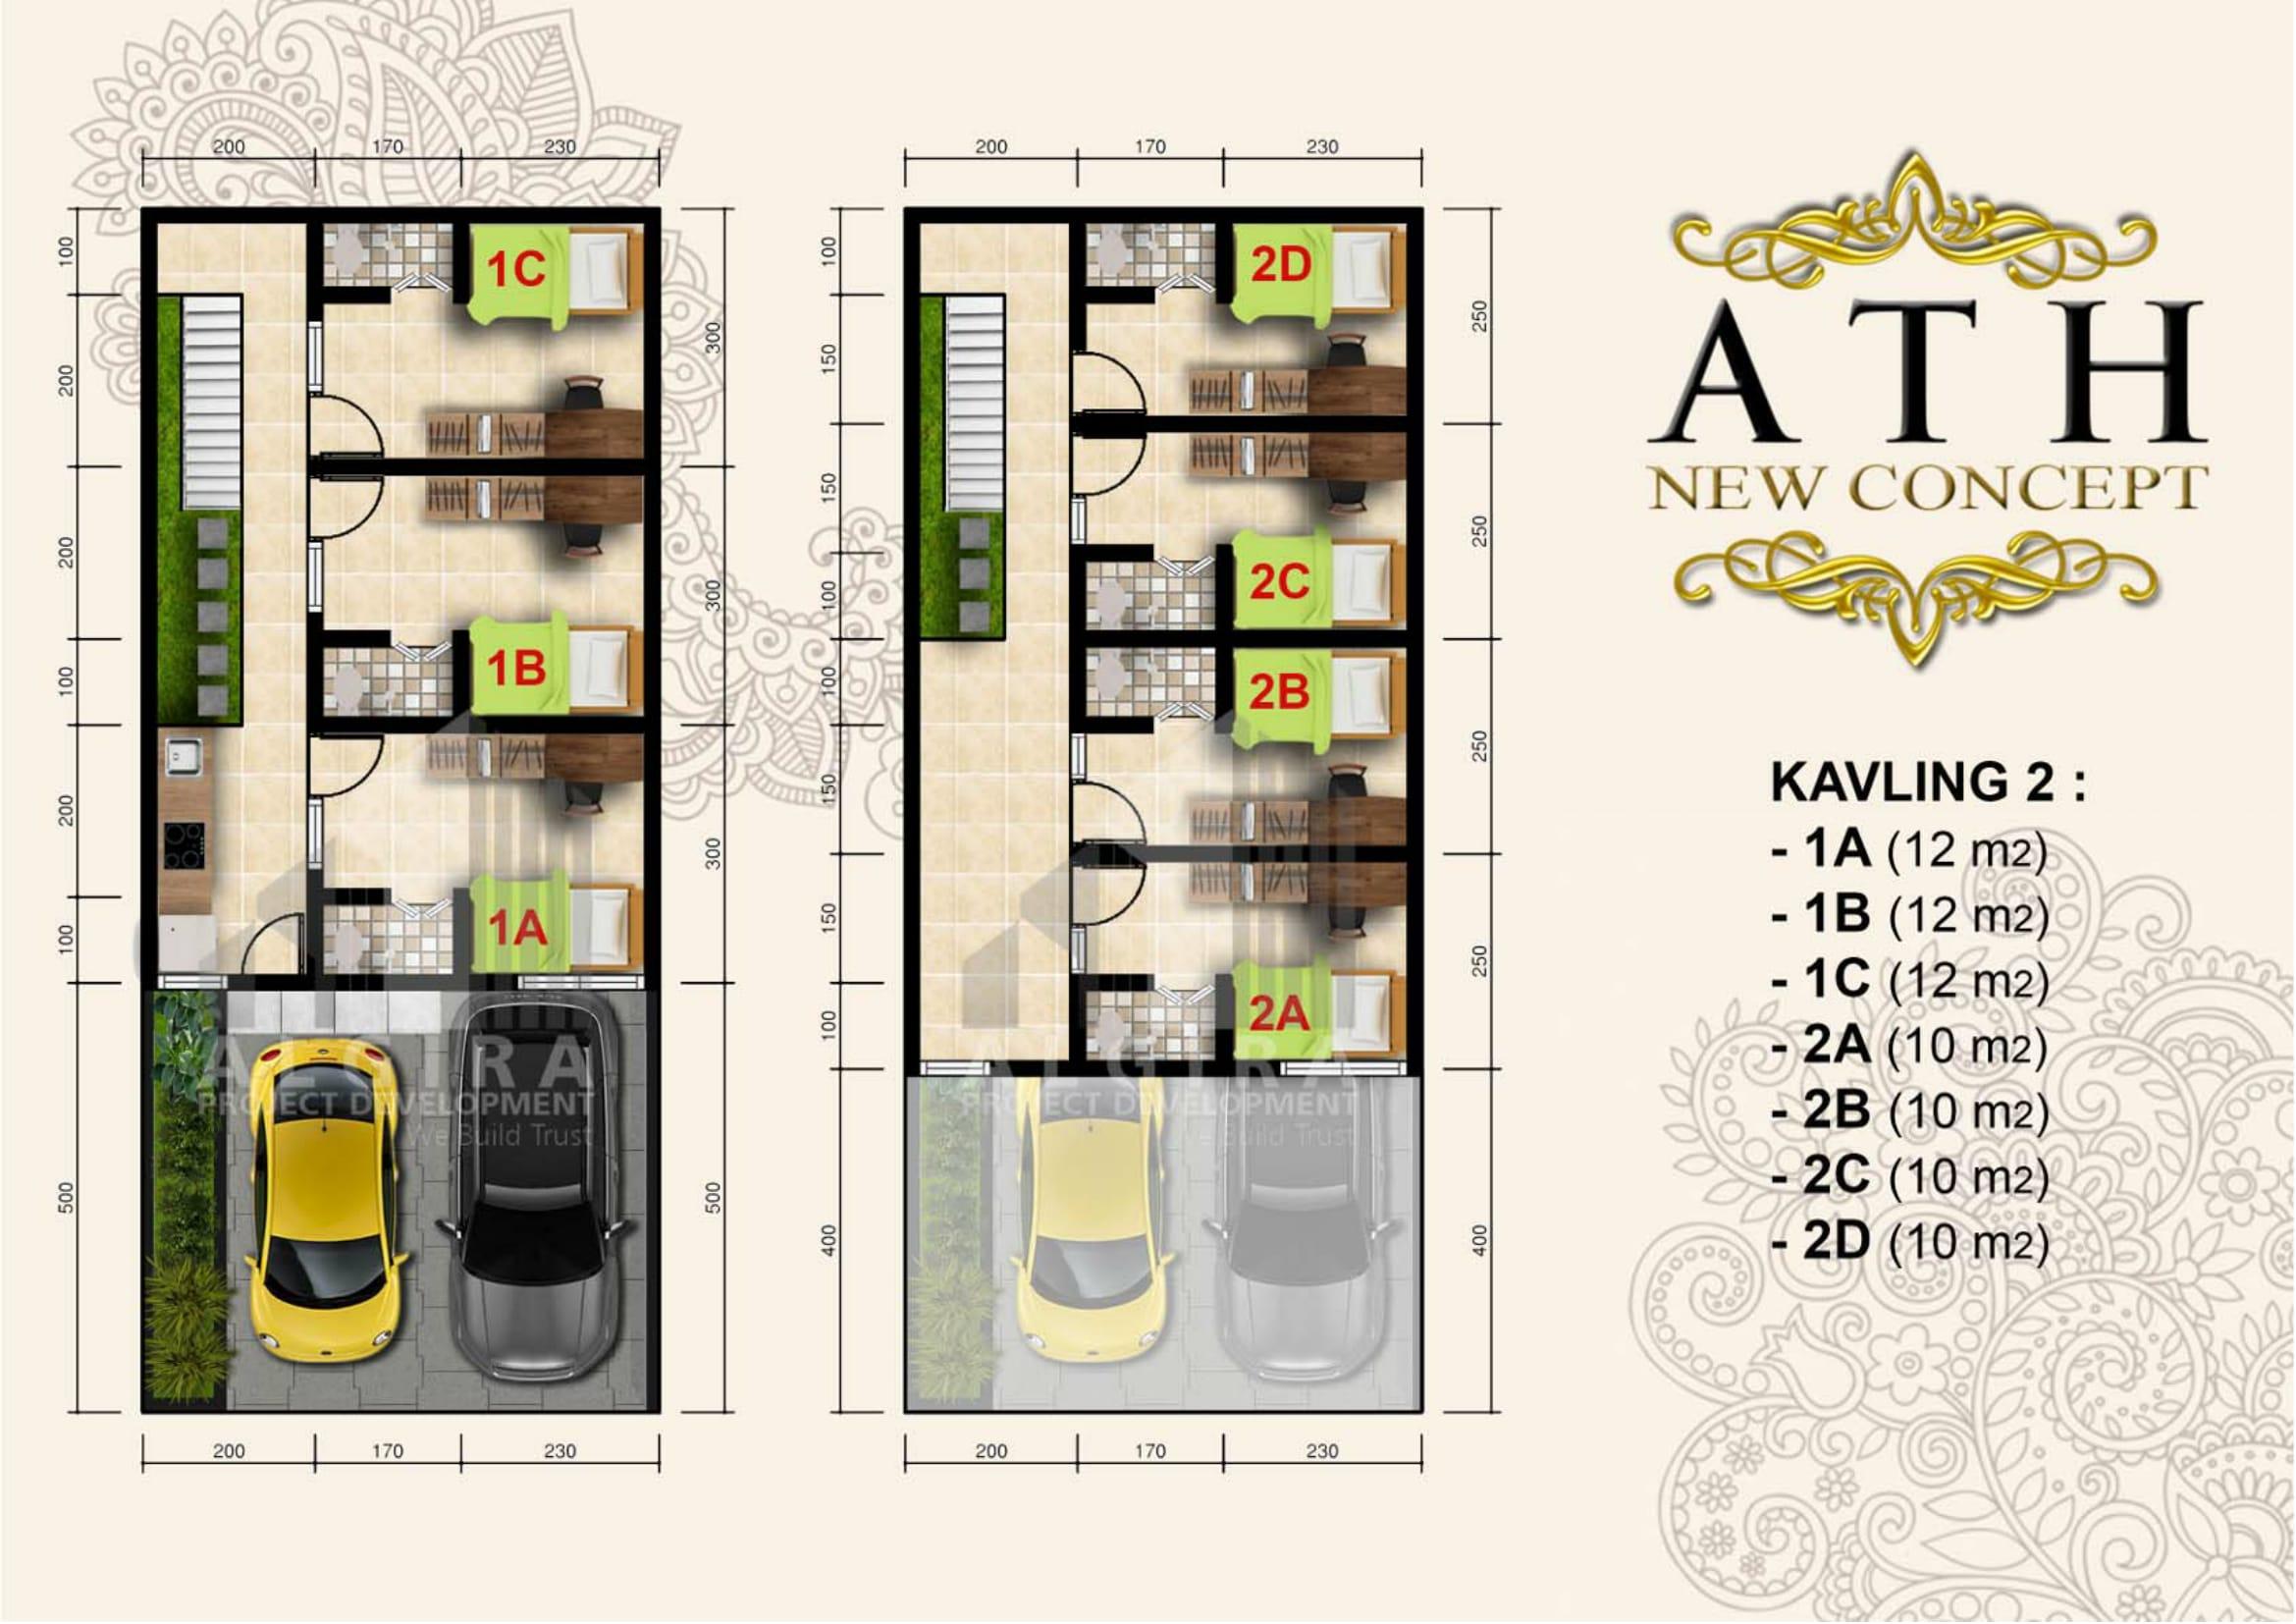 klikkprsyariah.ATH-new-concept-05